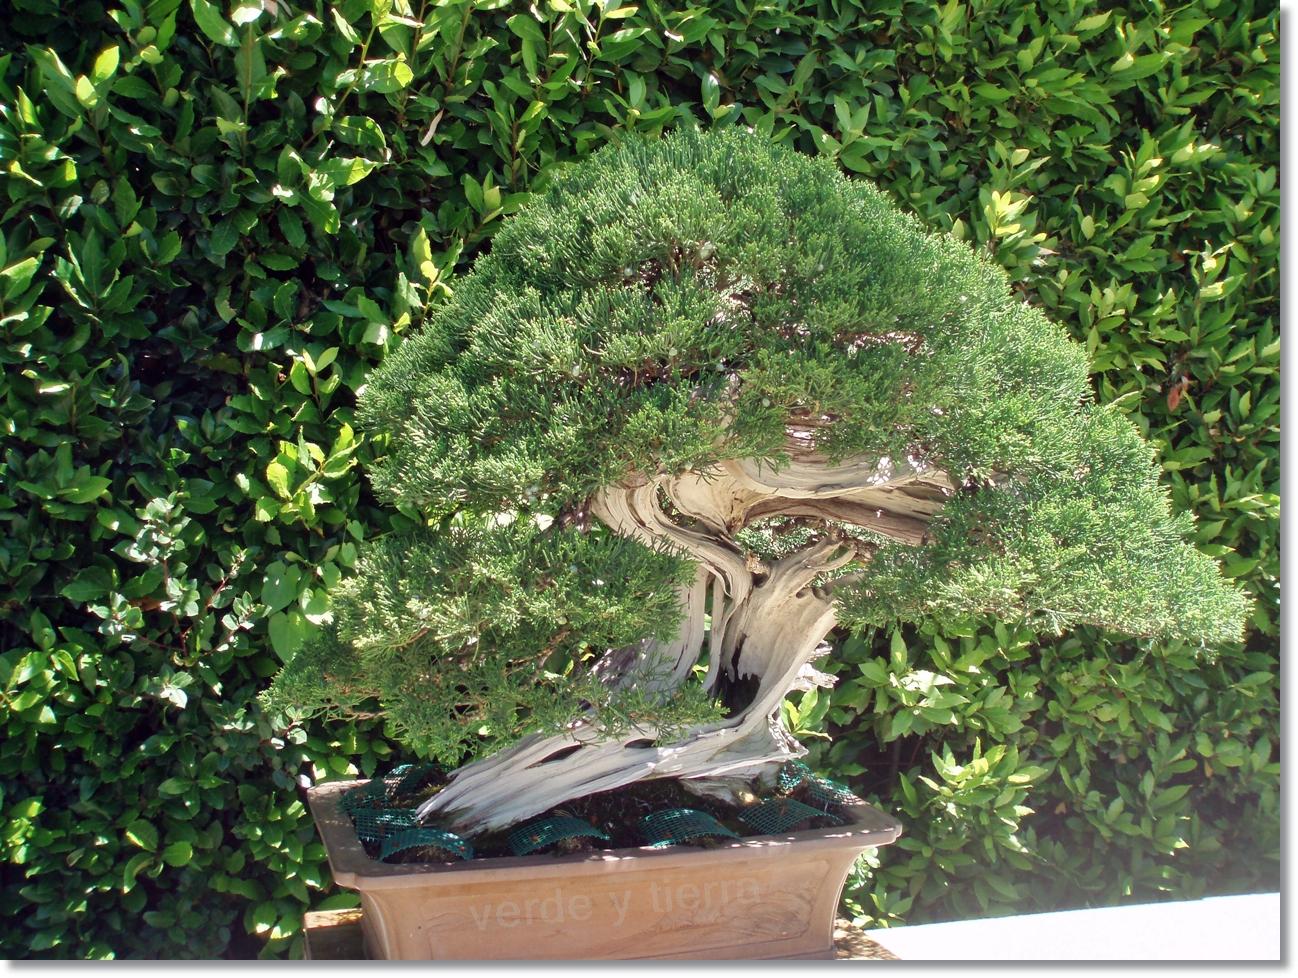 Verde y tierra los bonsais de felipe gonz lez - Tierra para bonsais ...